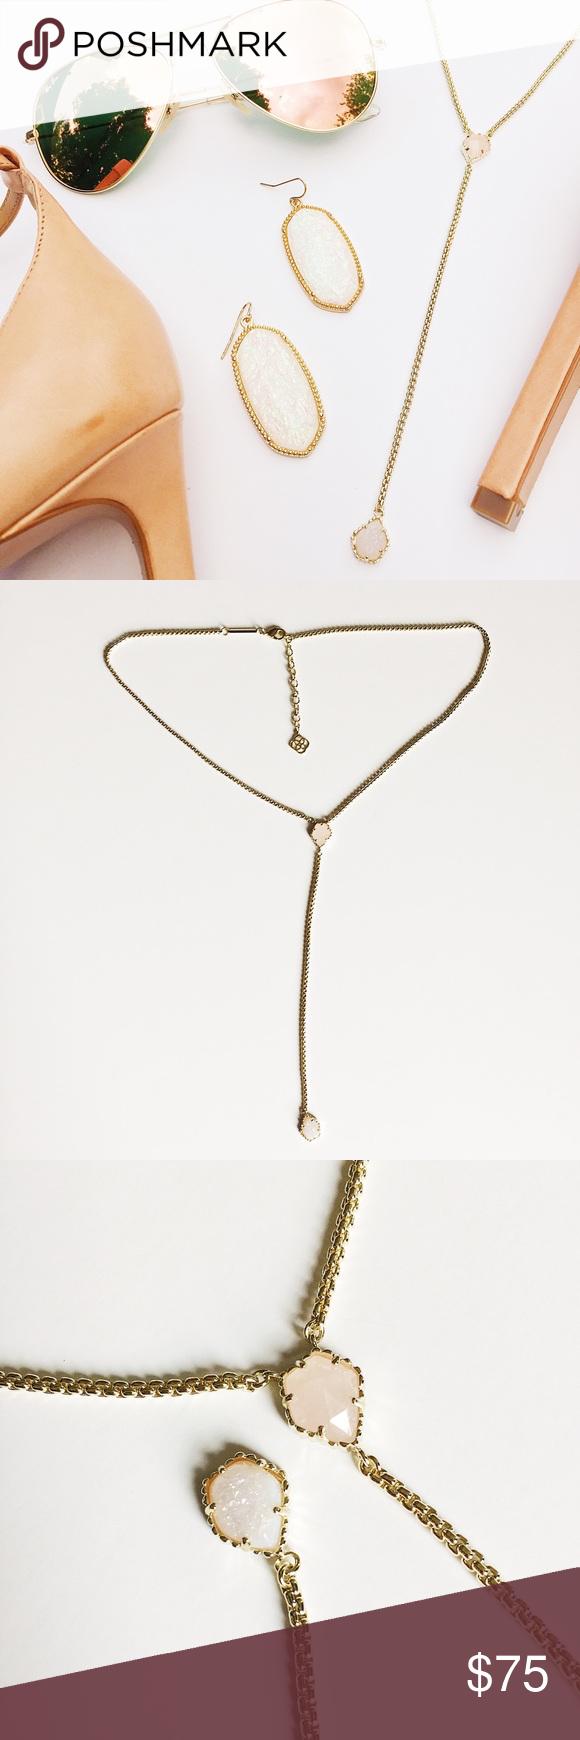 Kendra scott mason custom necklace stone kendra scott jewelry